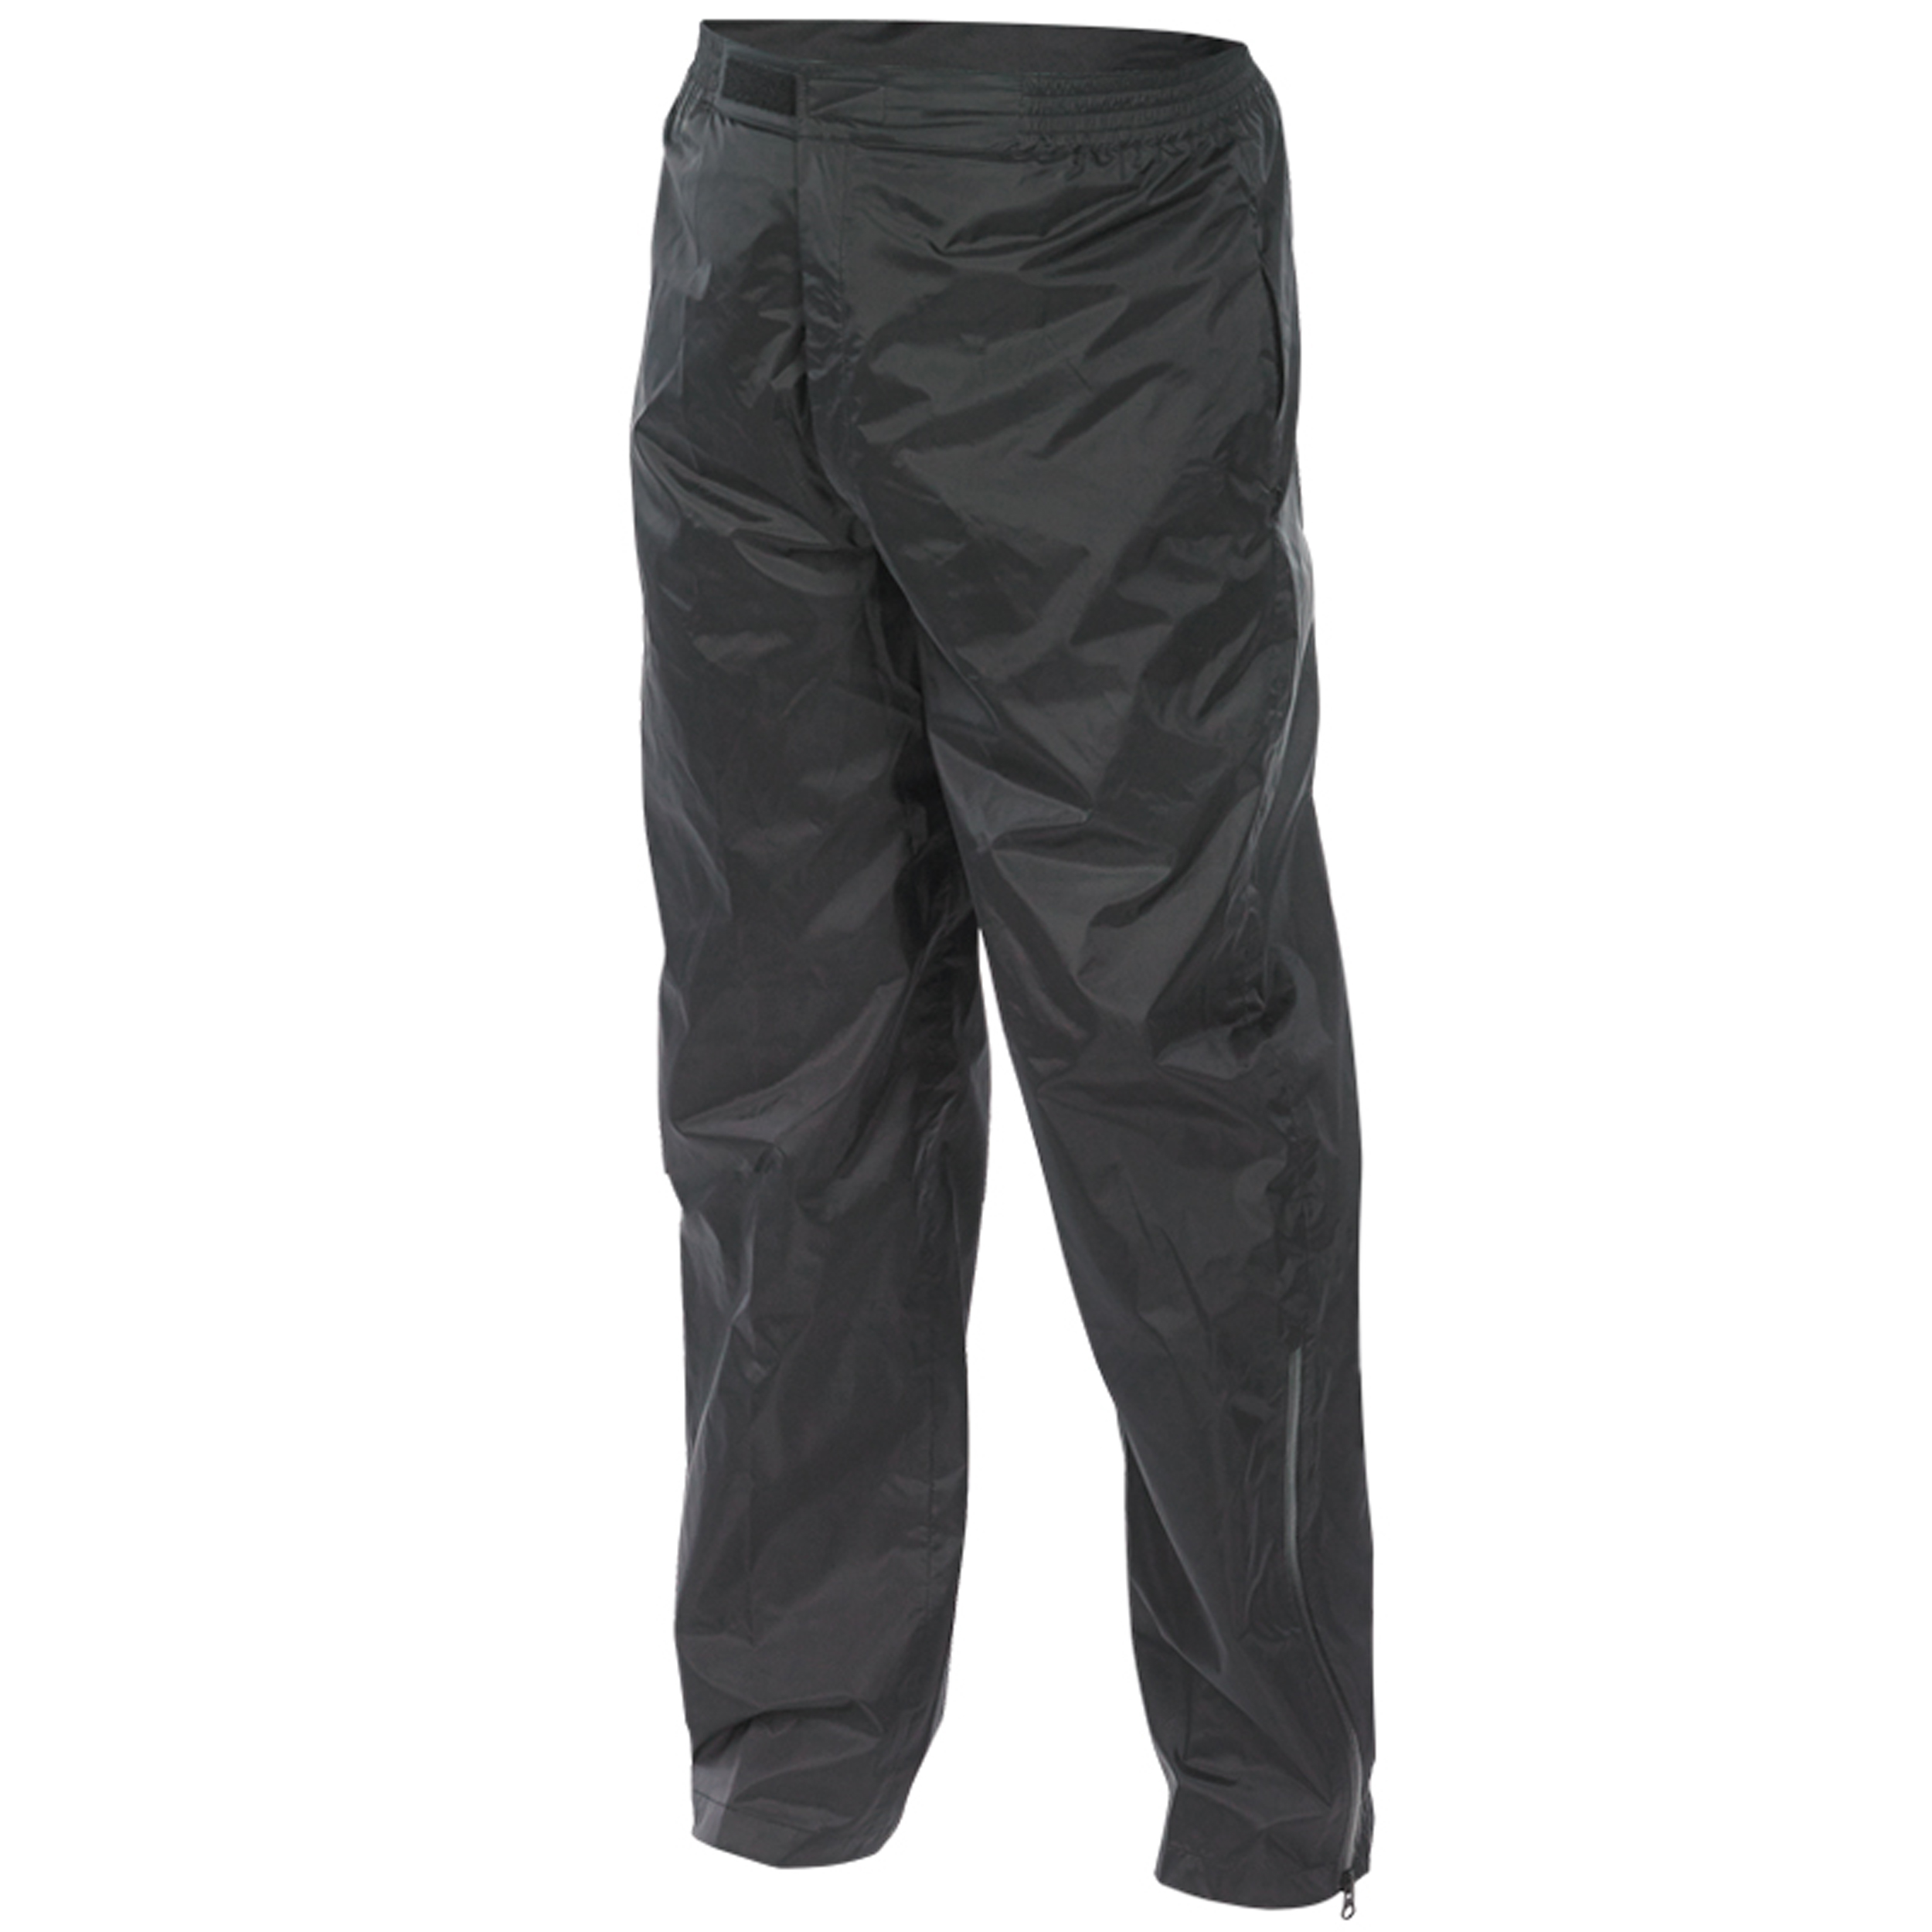 Snugpak Rp1 Rain Pants Black MD